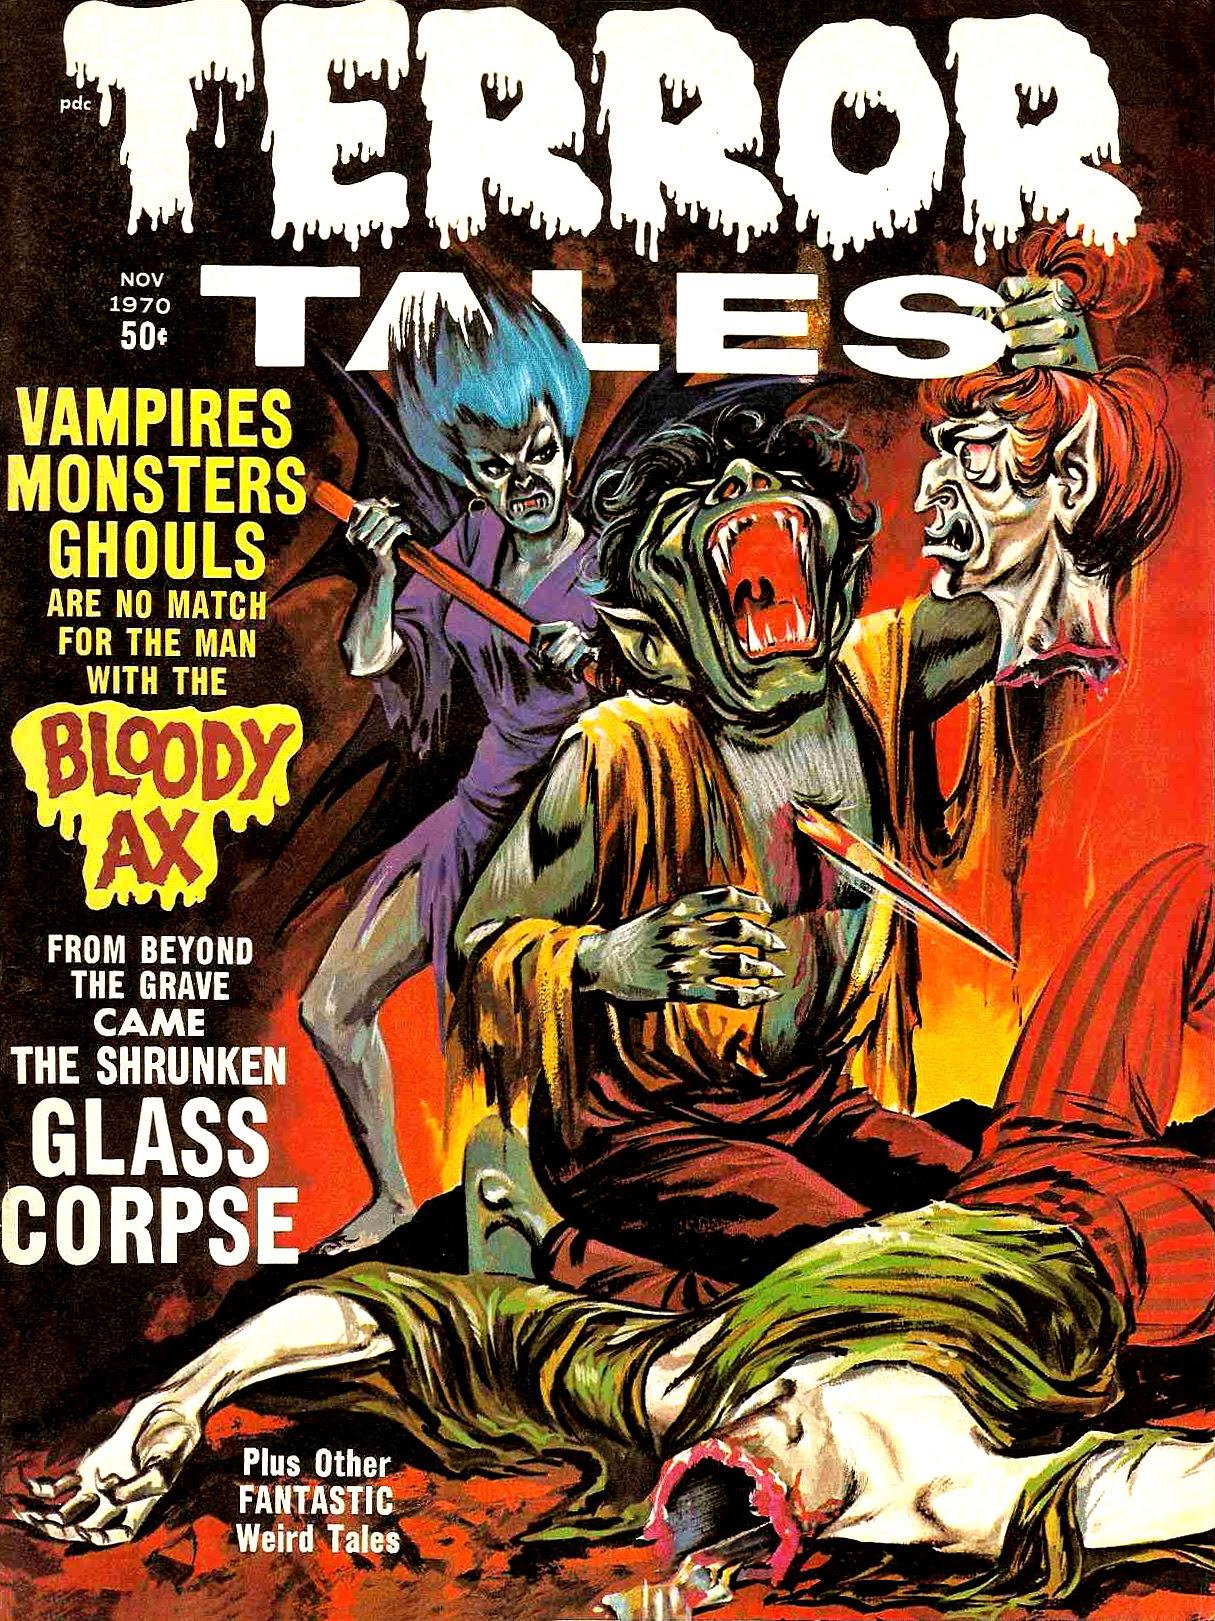 Terror Tales Vol. 02 #6 (Eerie Publications, 1970)